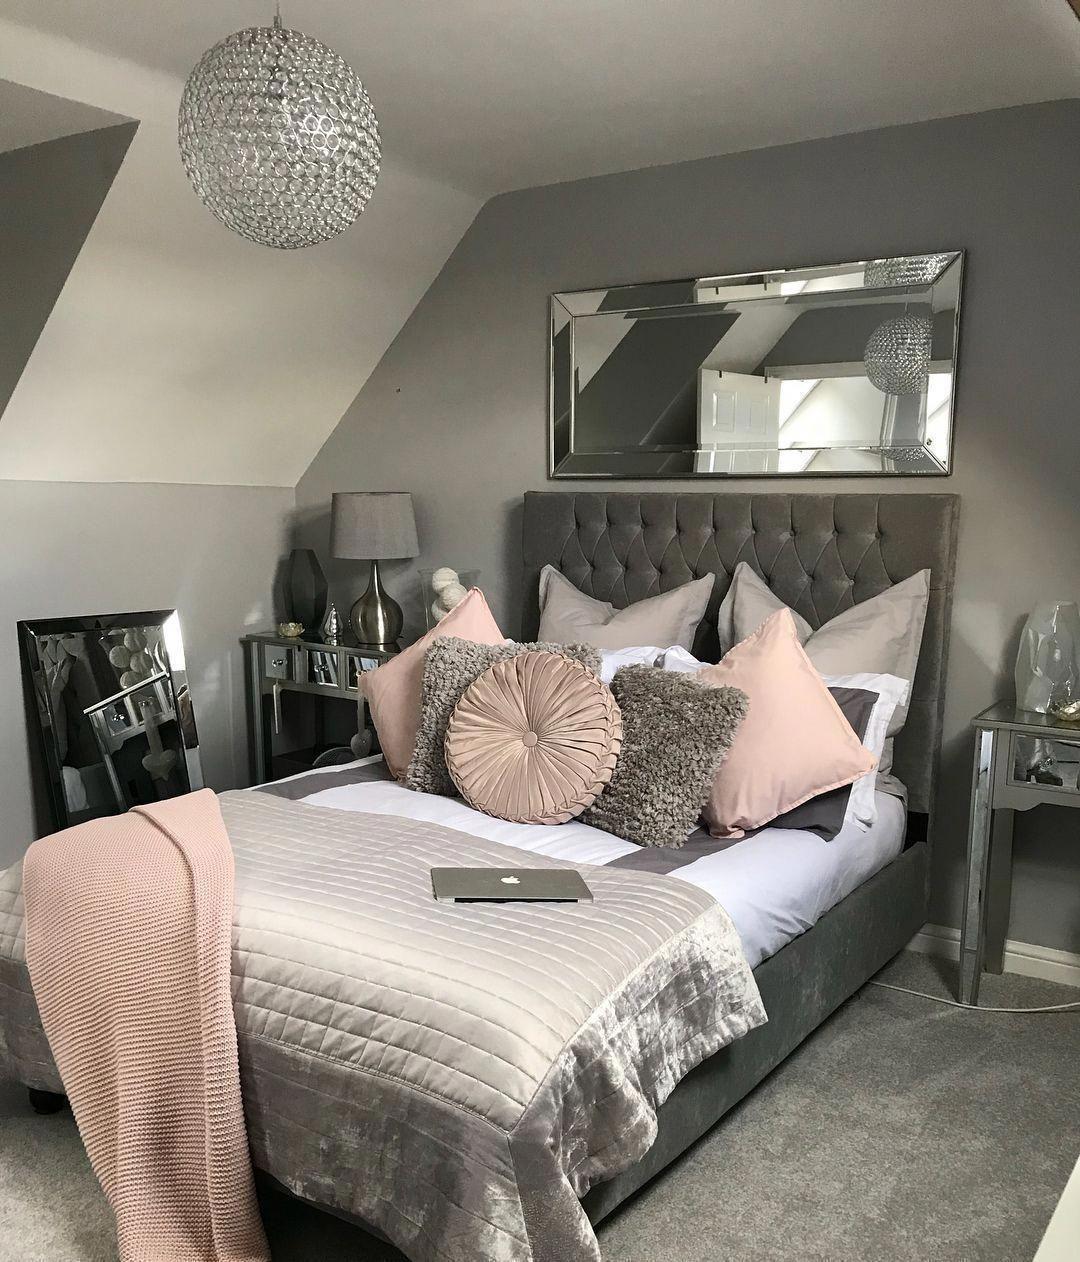 Warm And Cozy Master Bedroom Decorating Ideas 45 Coziem Com Masterbedroomsdecor Pink Bedroom Design Girl Bedroom Decor Bedroom Interior